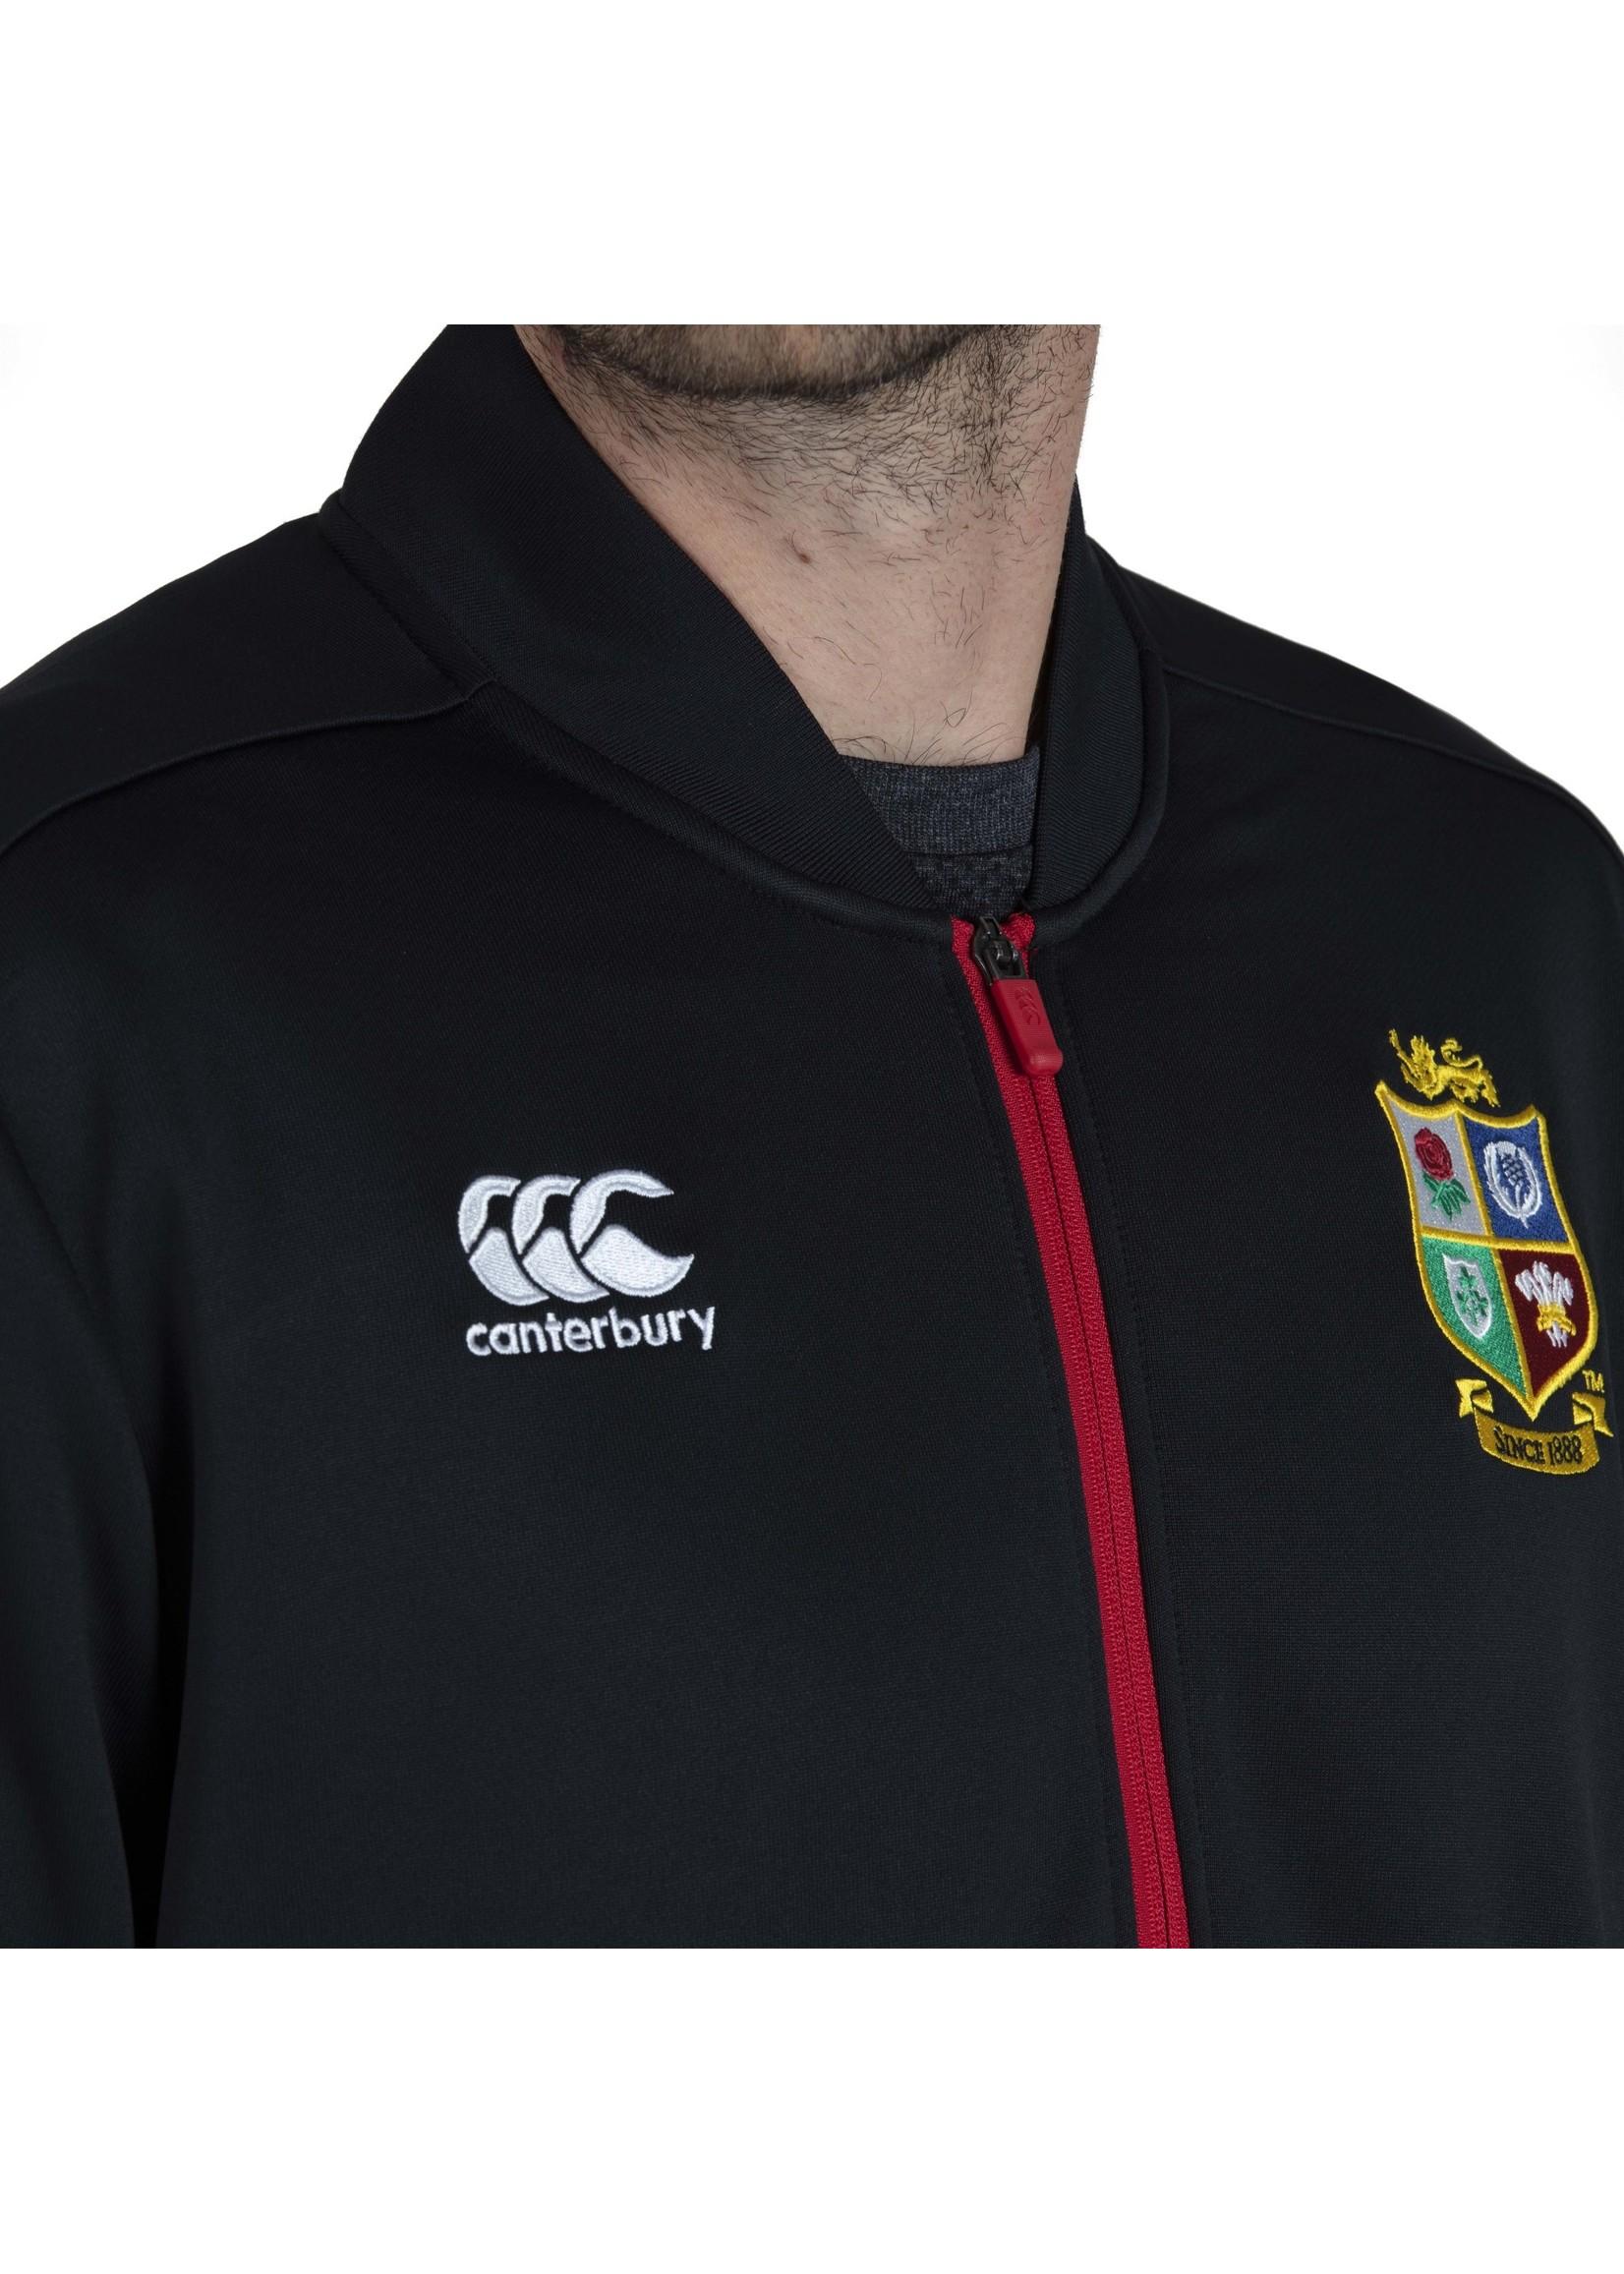 Canterbury British & Irish Lions - Mens Track Jacket (2021) - Black